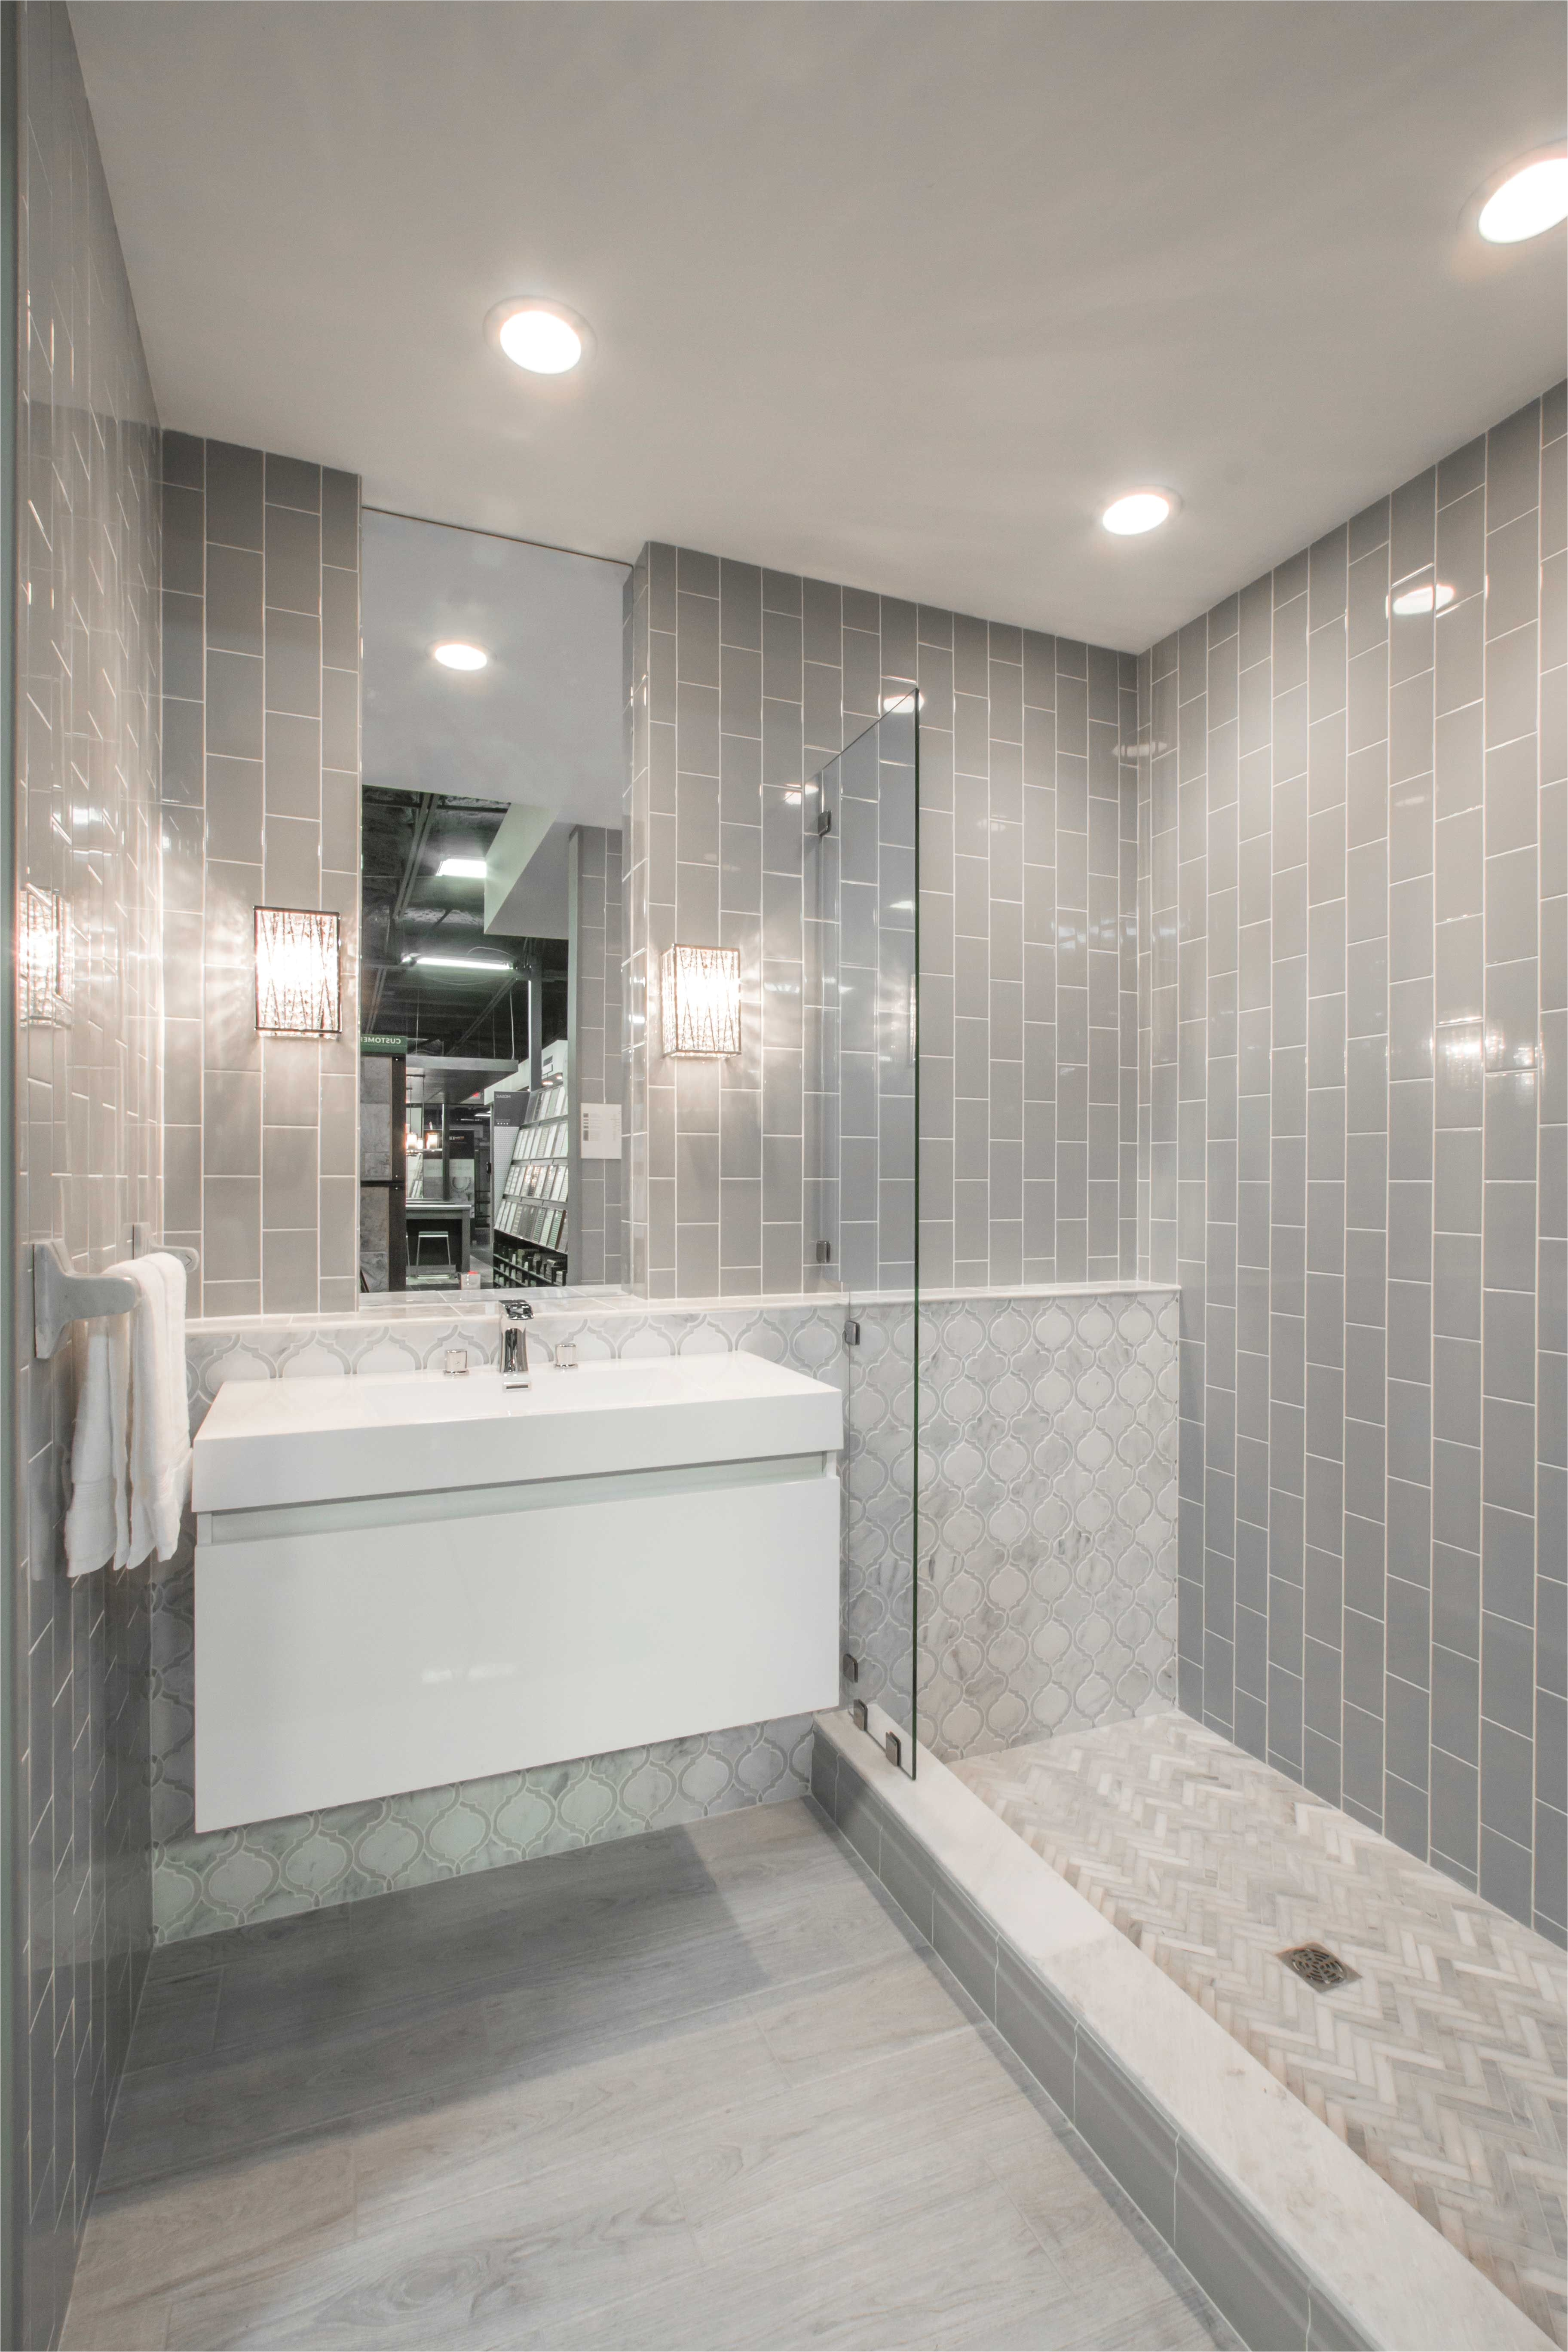 Bathroom Tile Design Ideas Uk Pin by Sabrina Simmons On Bathrooms In 2018